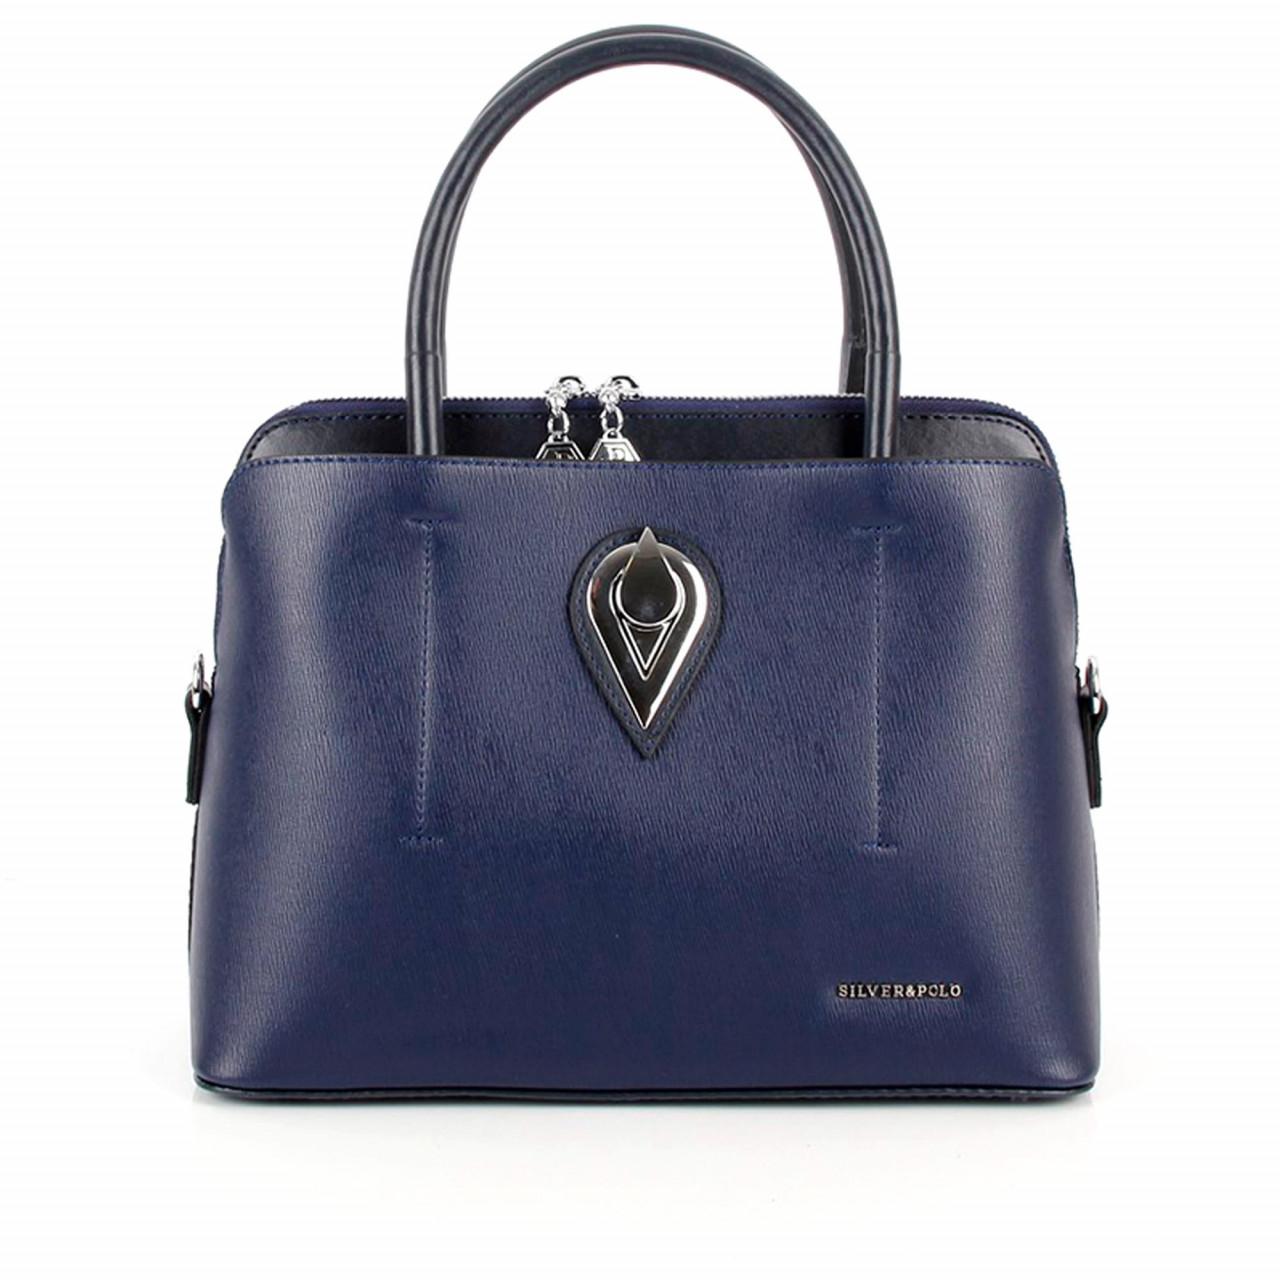 Елегантна дамска чанта в тъмносиньо